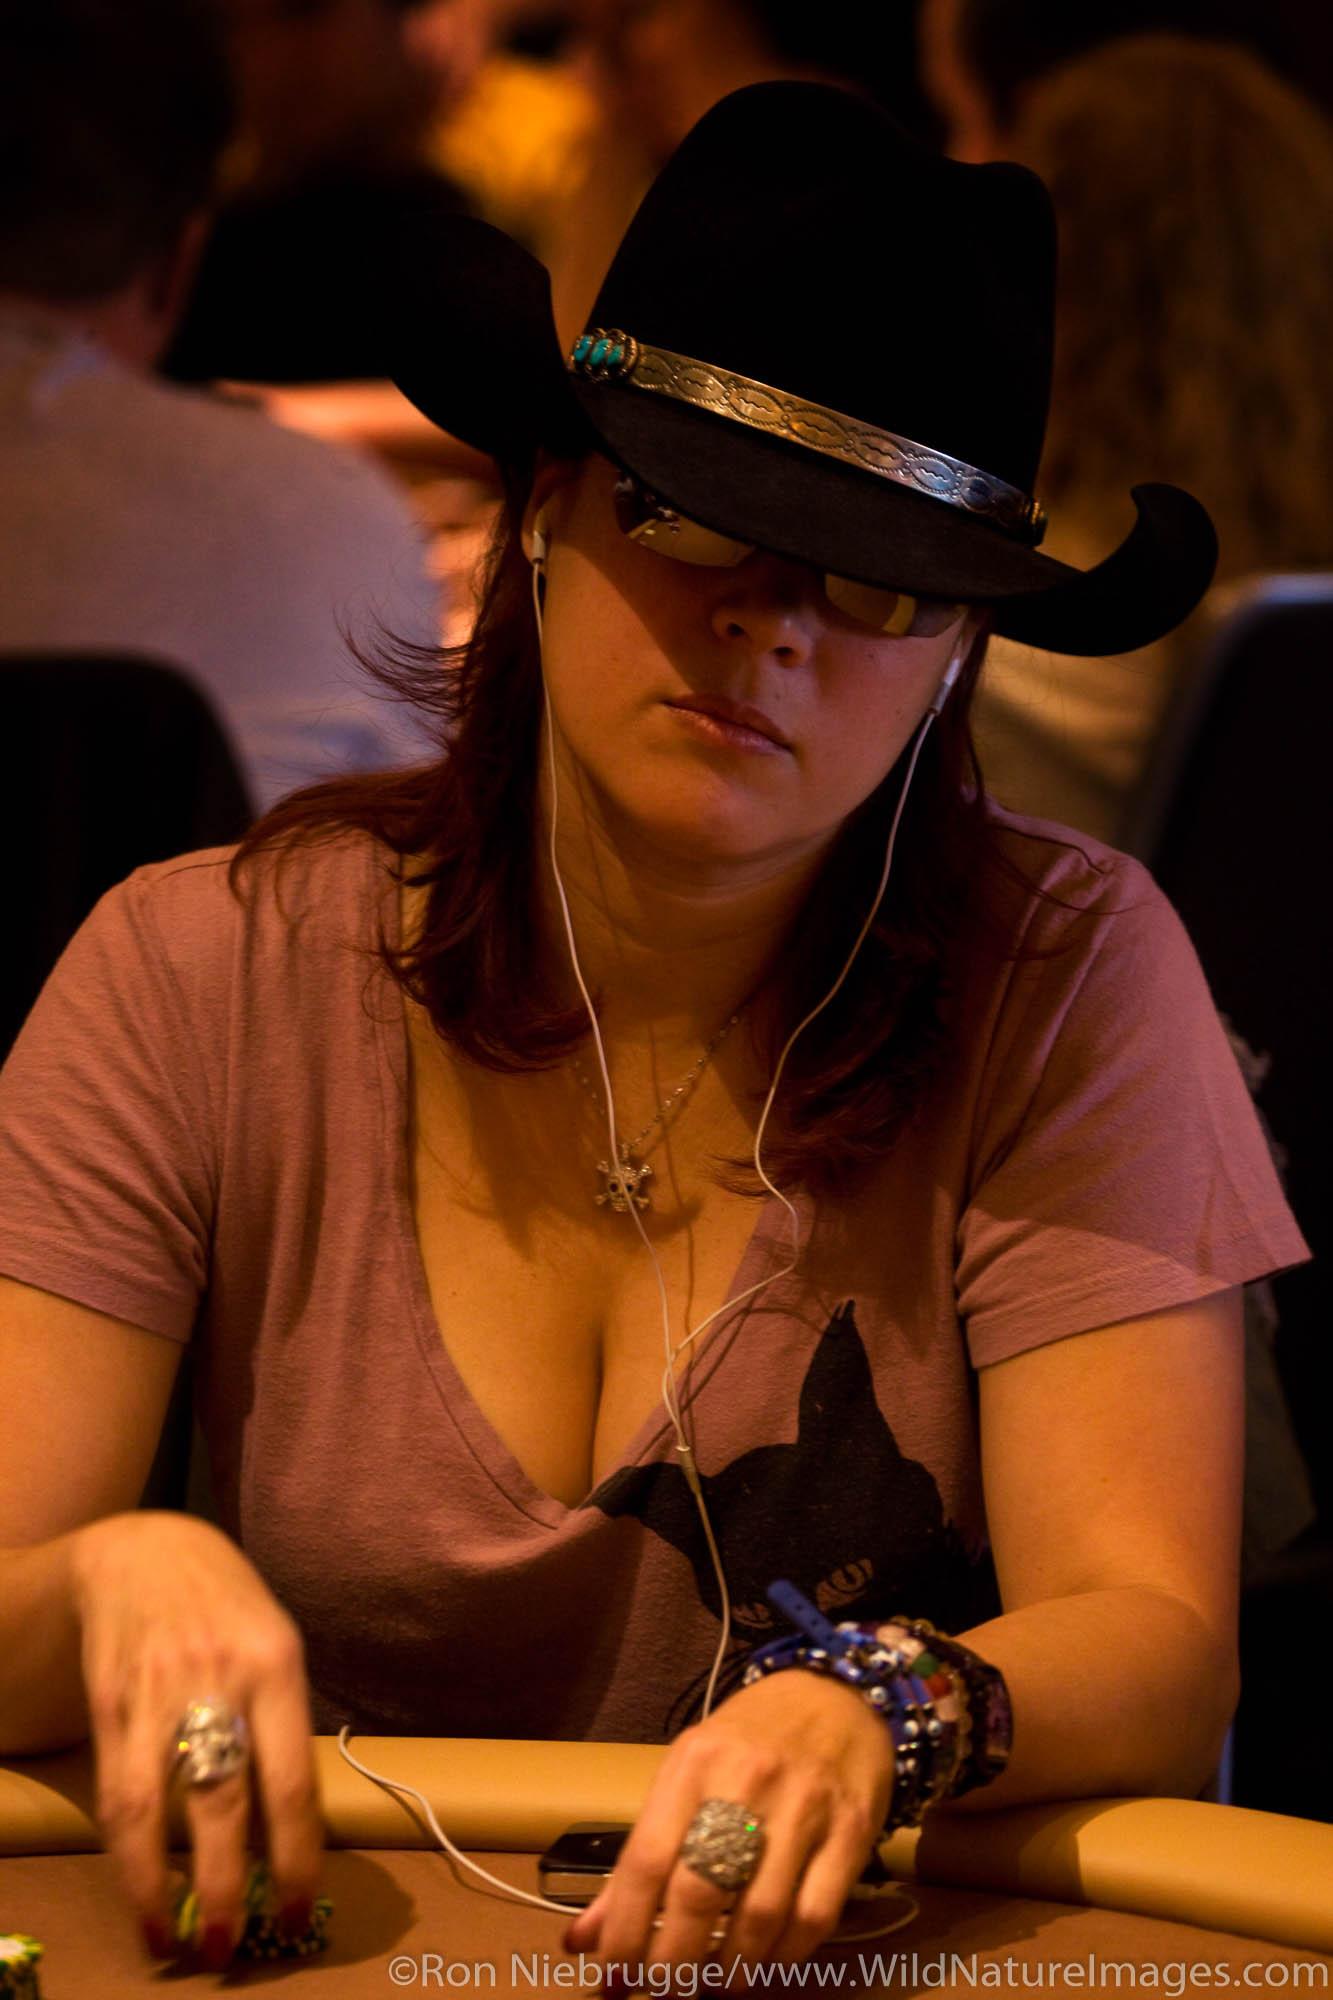 Jennifer Tilly at the 2008 World Poker Tour Festa Al Lago poker tournament at the Bellagio Resort and Casino, Las Vegas, Nevada...